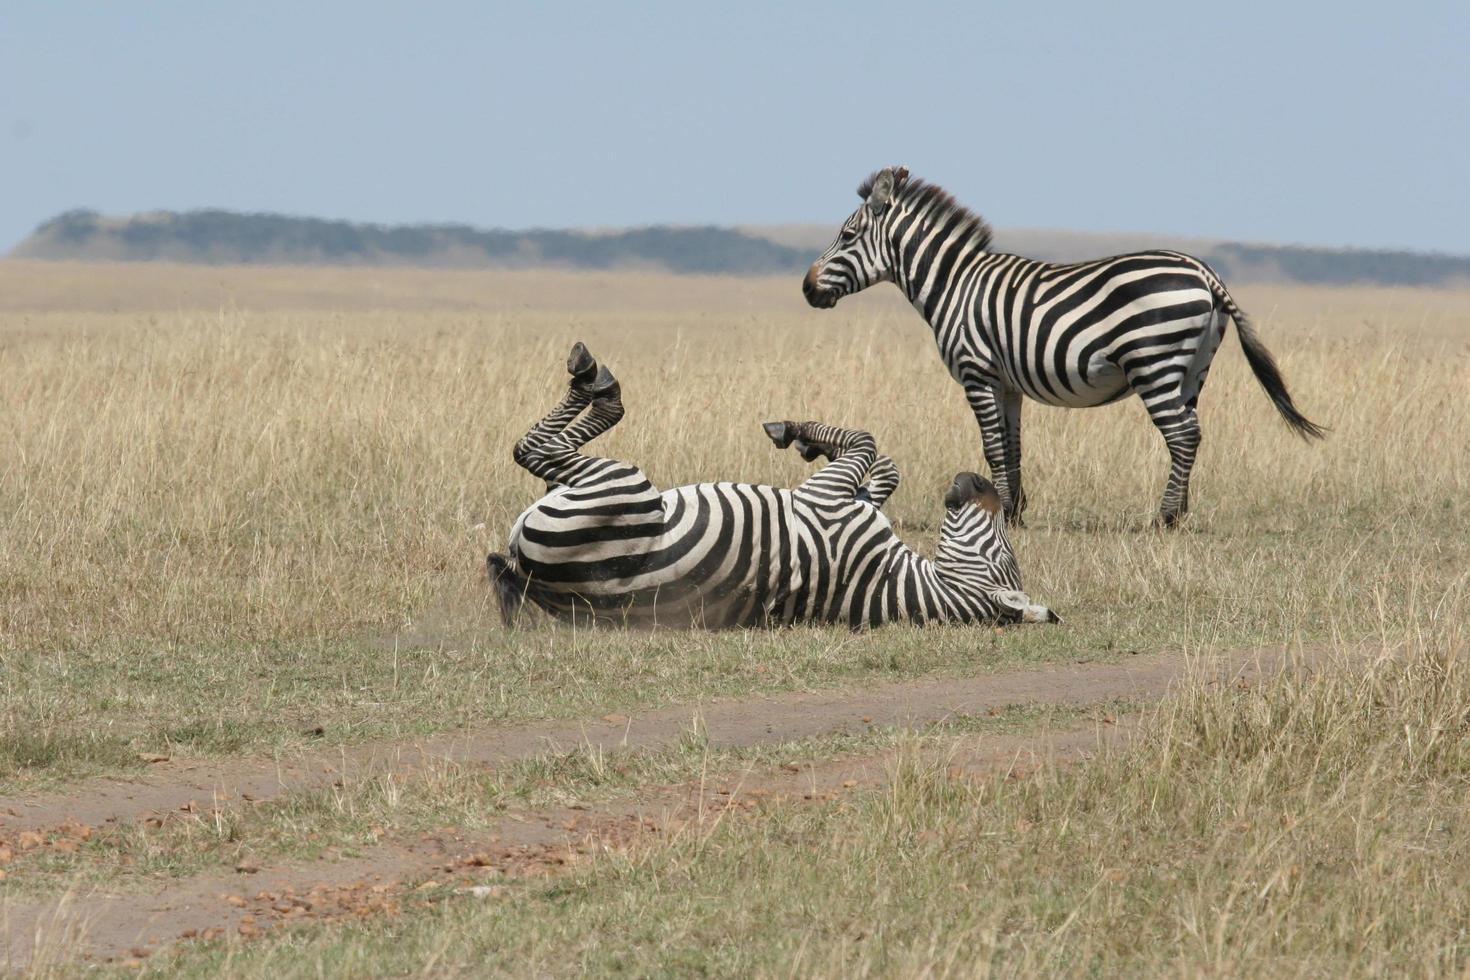 due zebre nella fauna selvatica foto